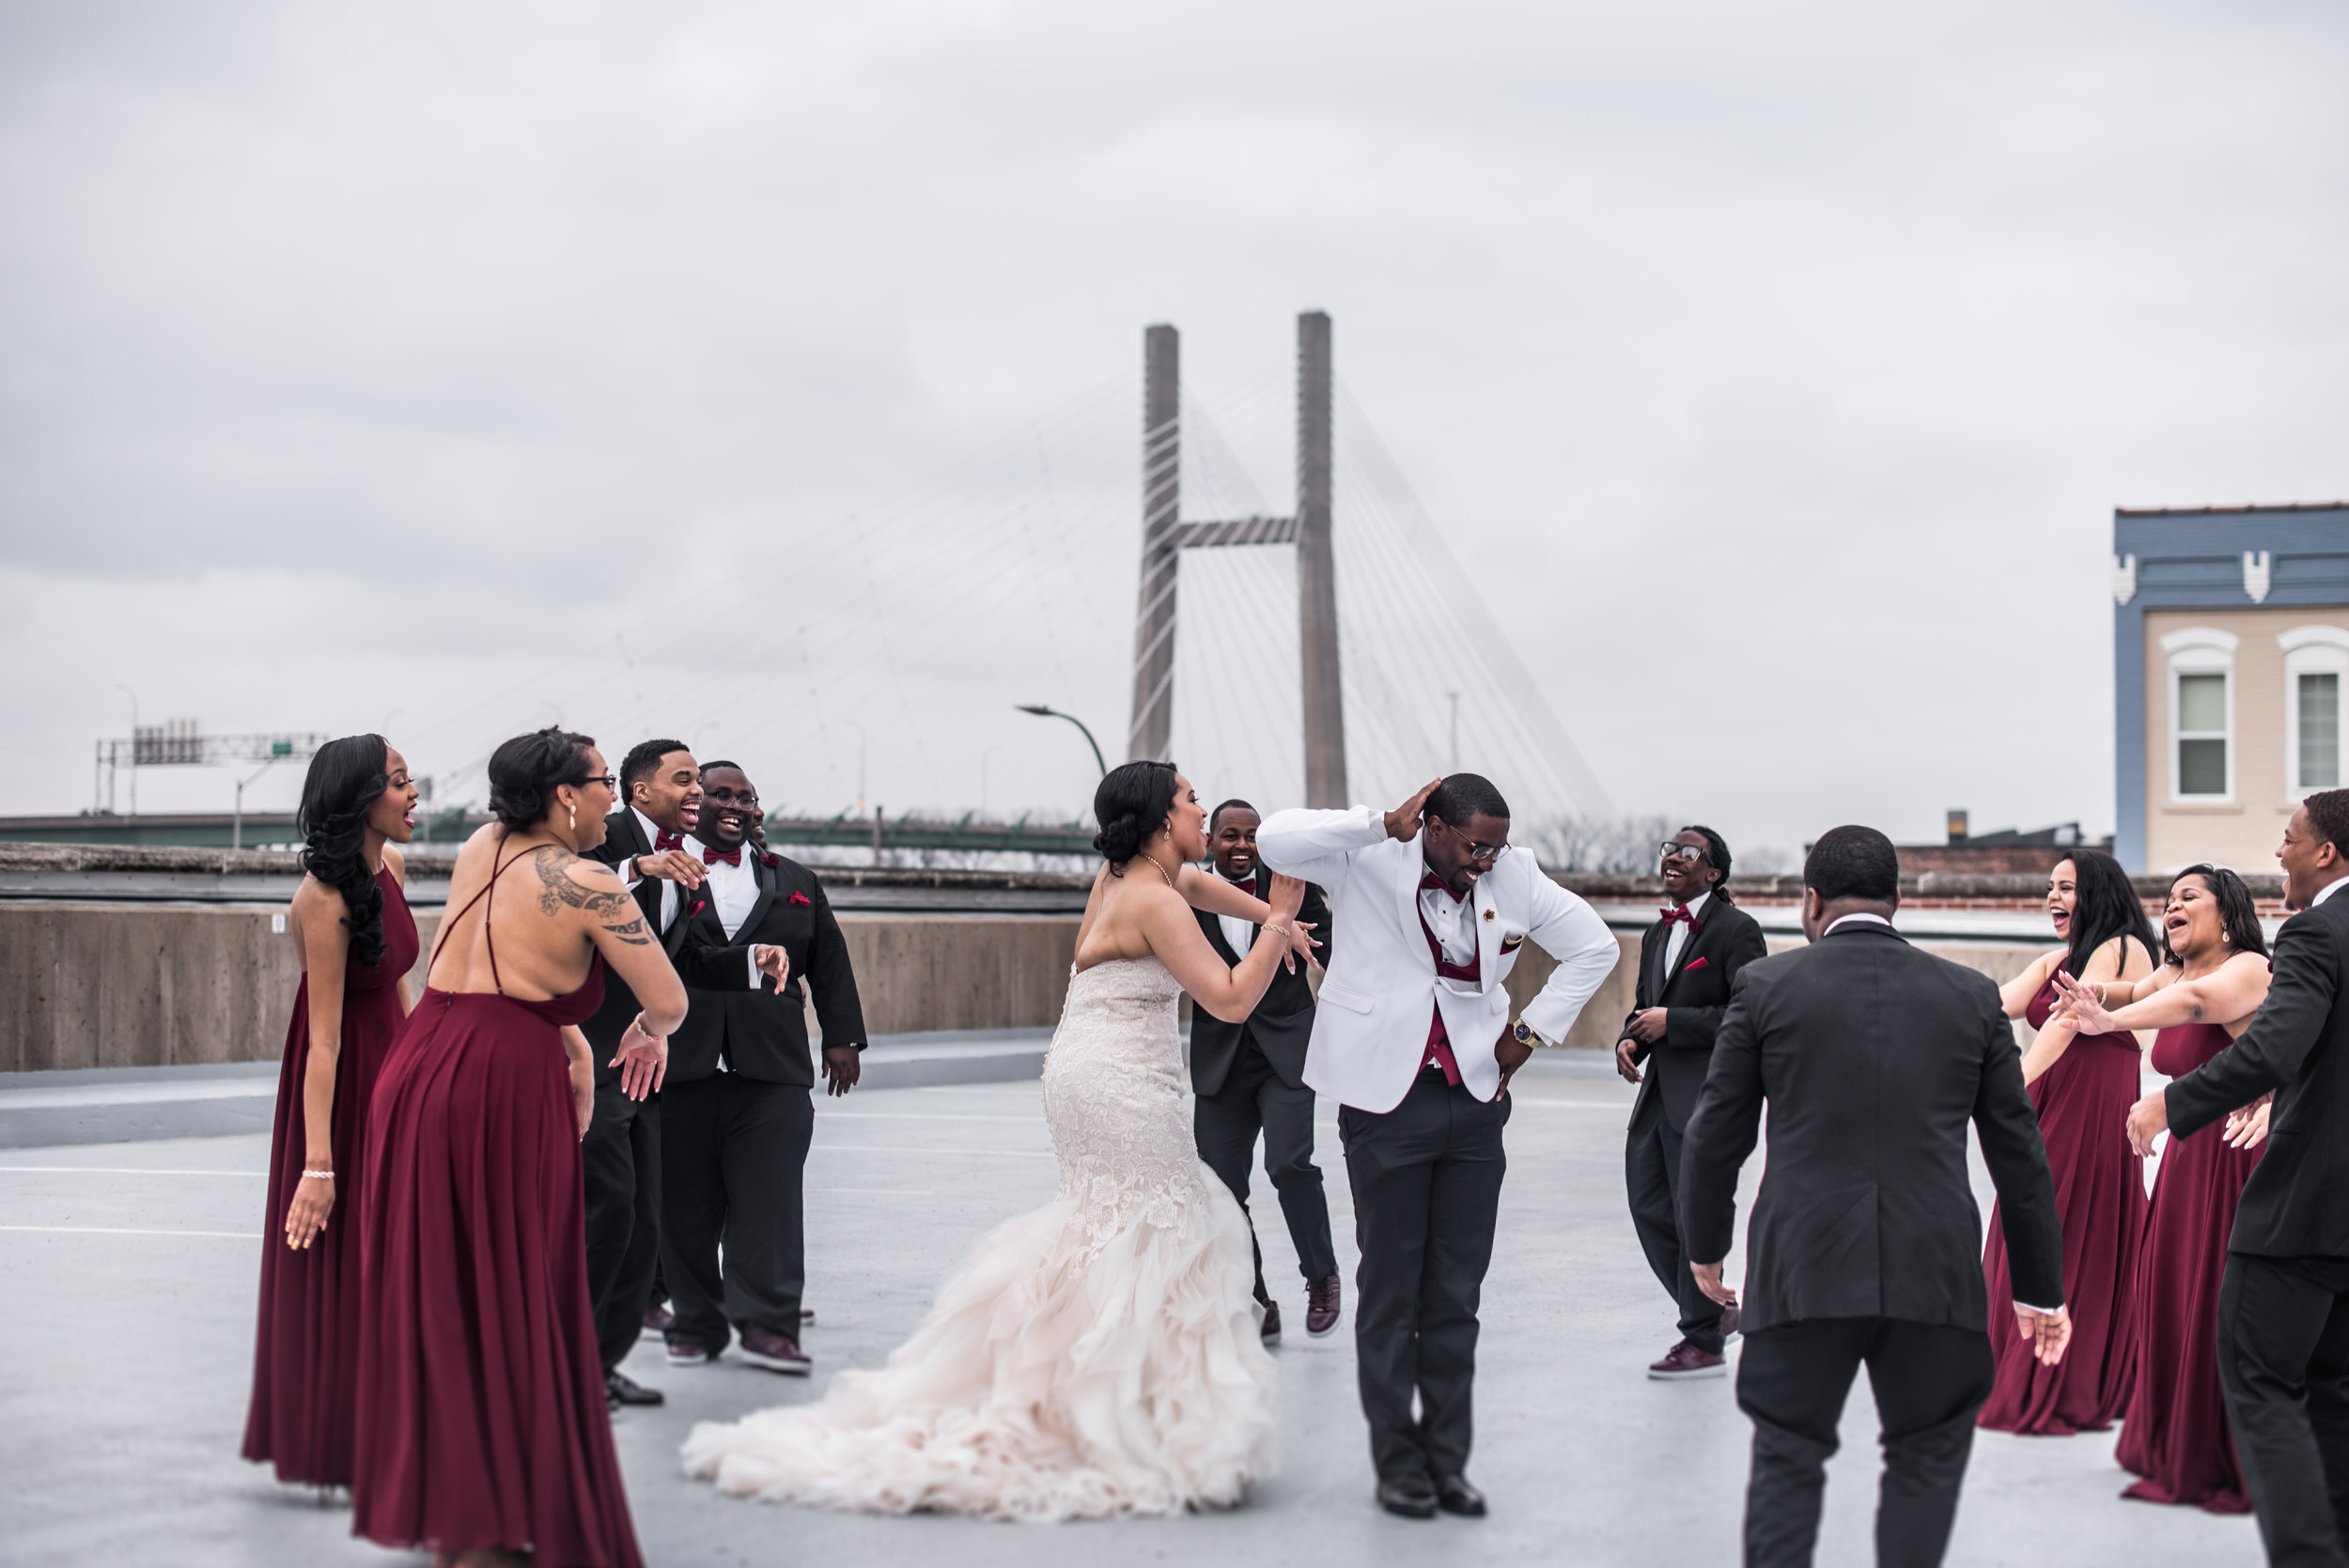 Burlington Iowa Wedding Midwest Photographer Melissa Cervantes _ Chantelle and Isaiah 610d.jpg